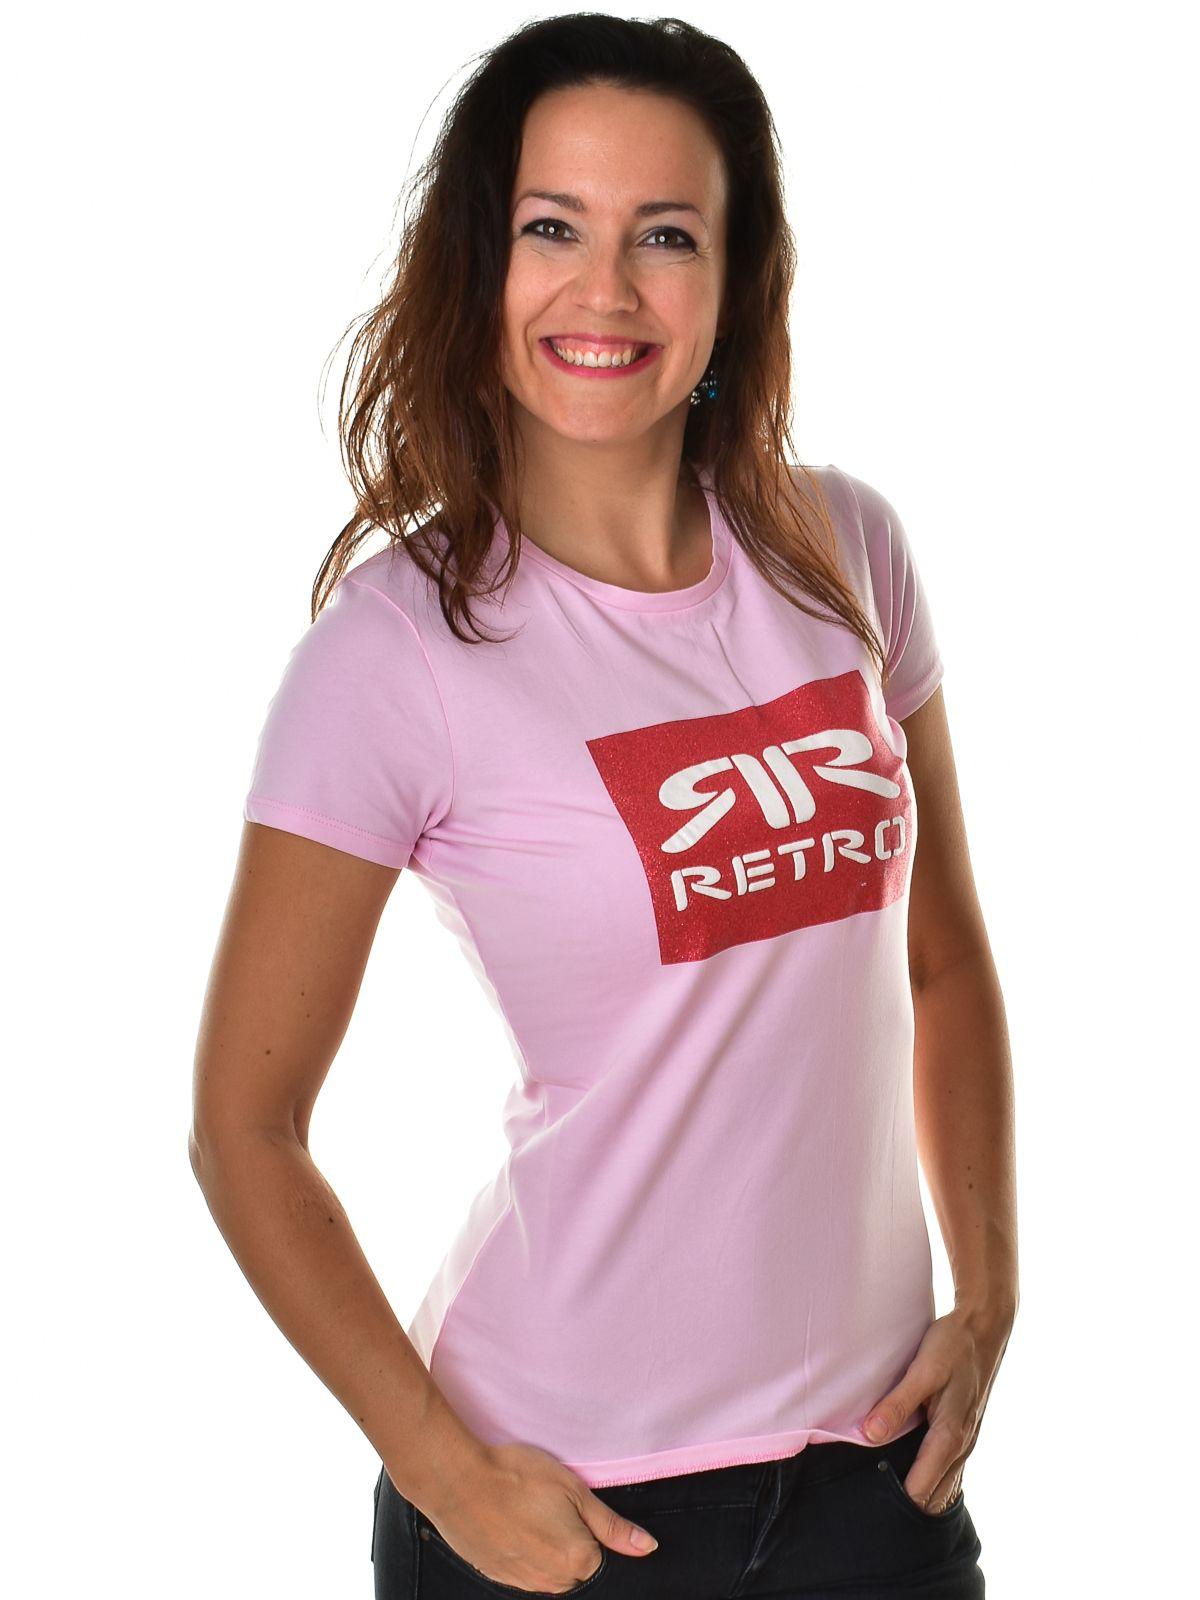 Retro Jeans női póló TREASURE T SHIRT | Markasbolt.hu